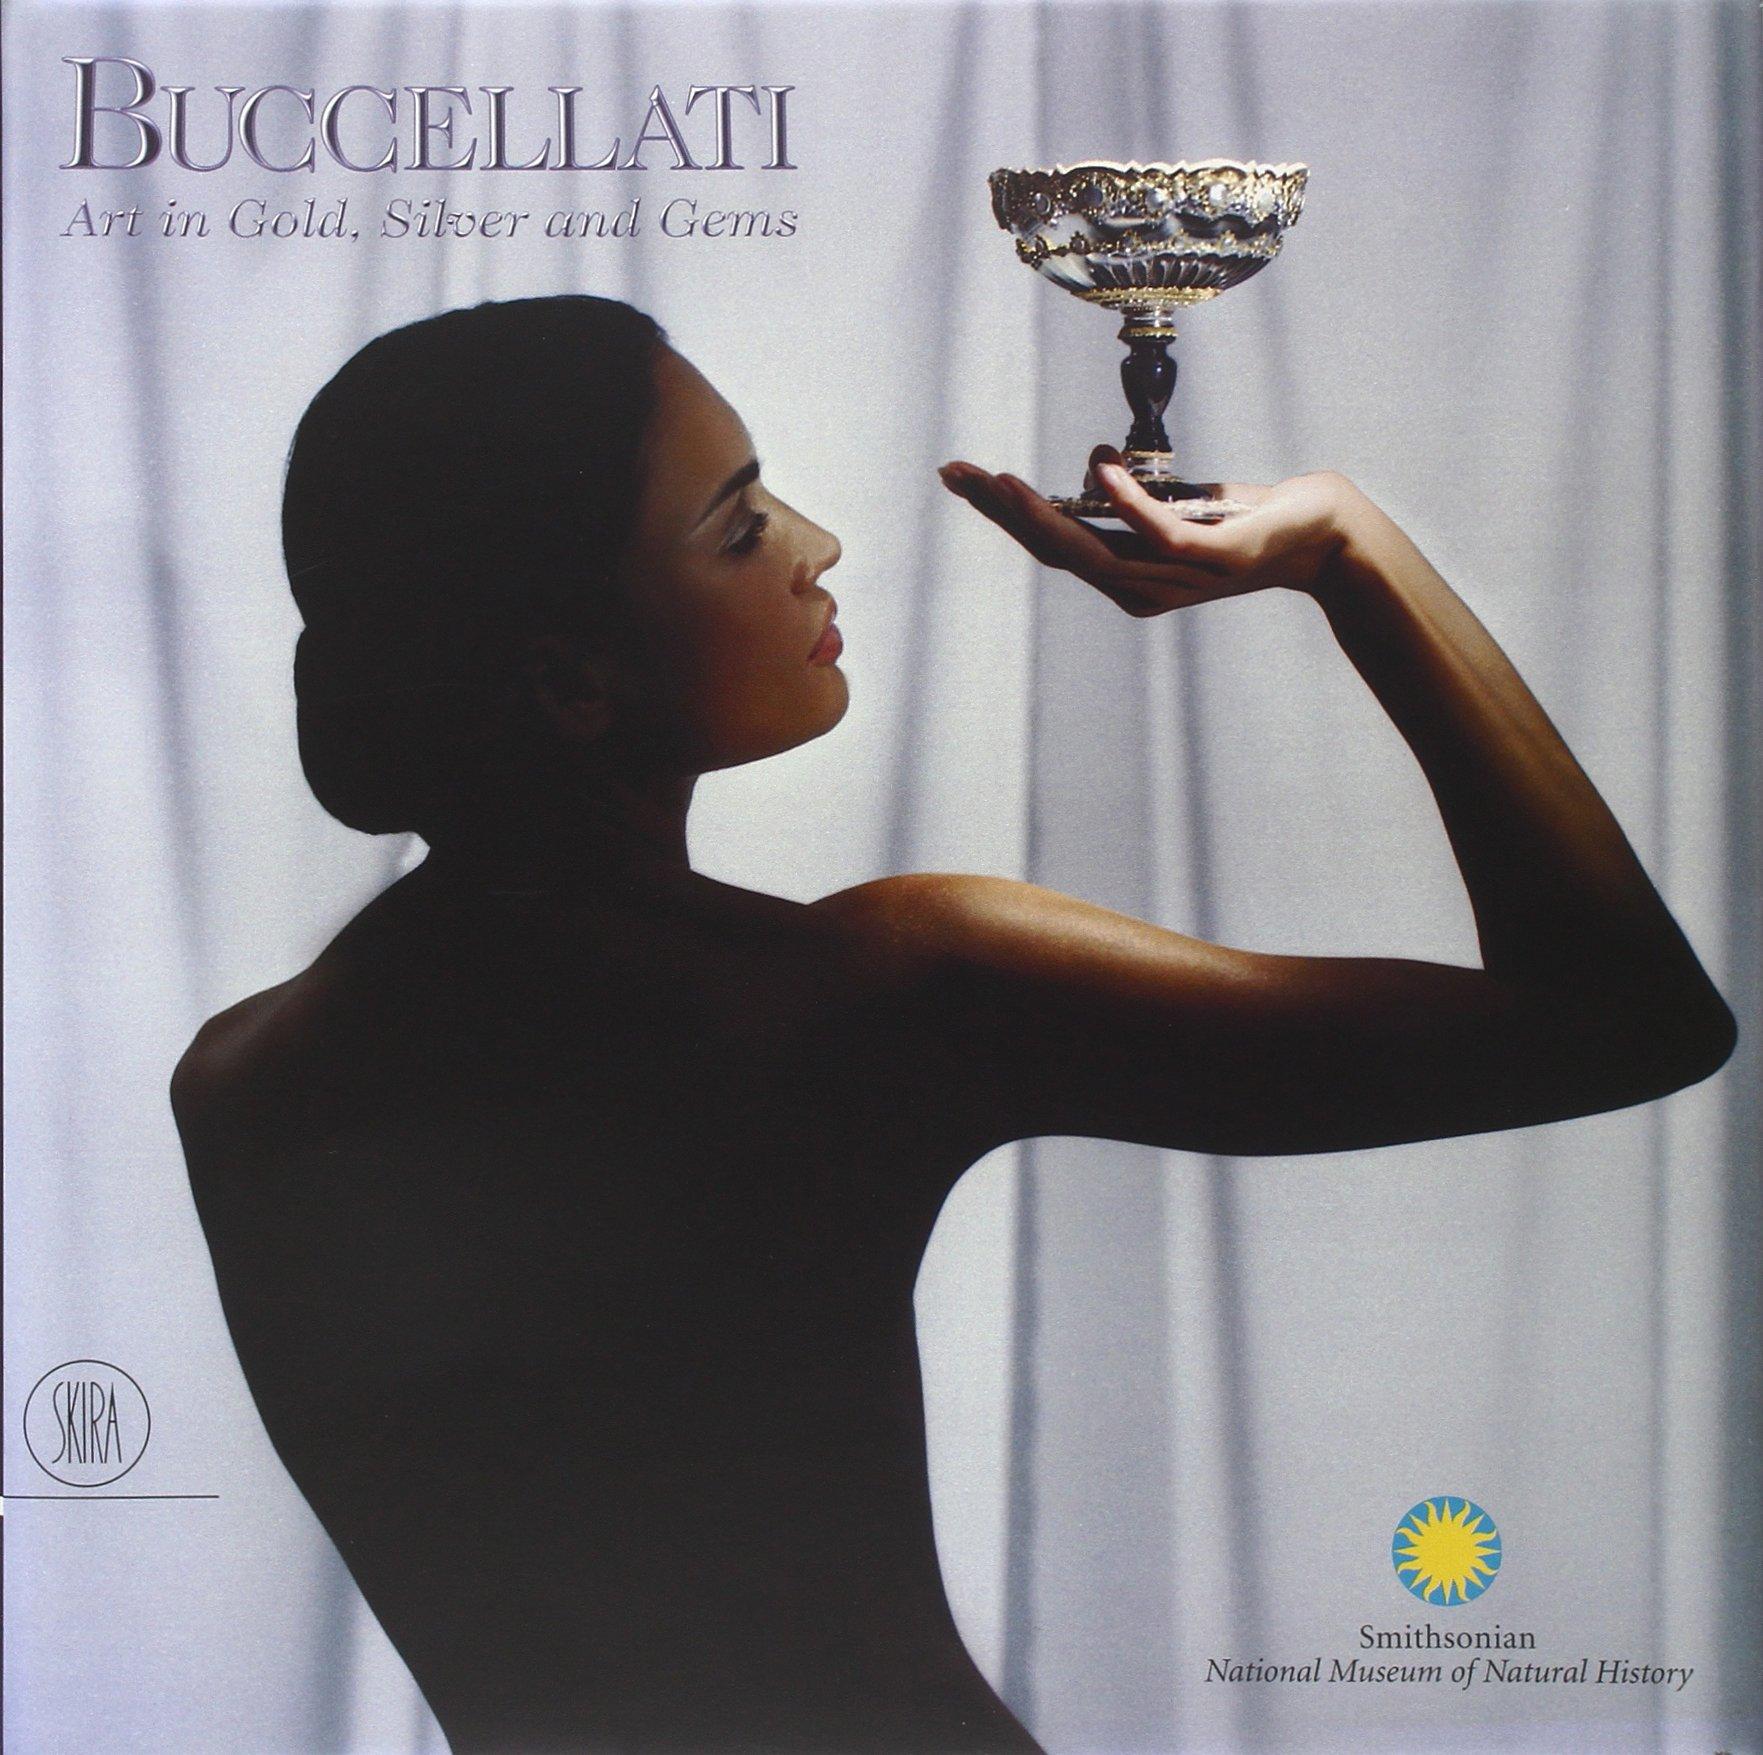 Buccellati: Art in Gold, Silver, and Gems